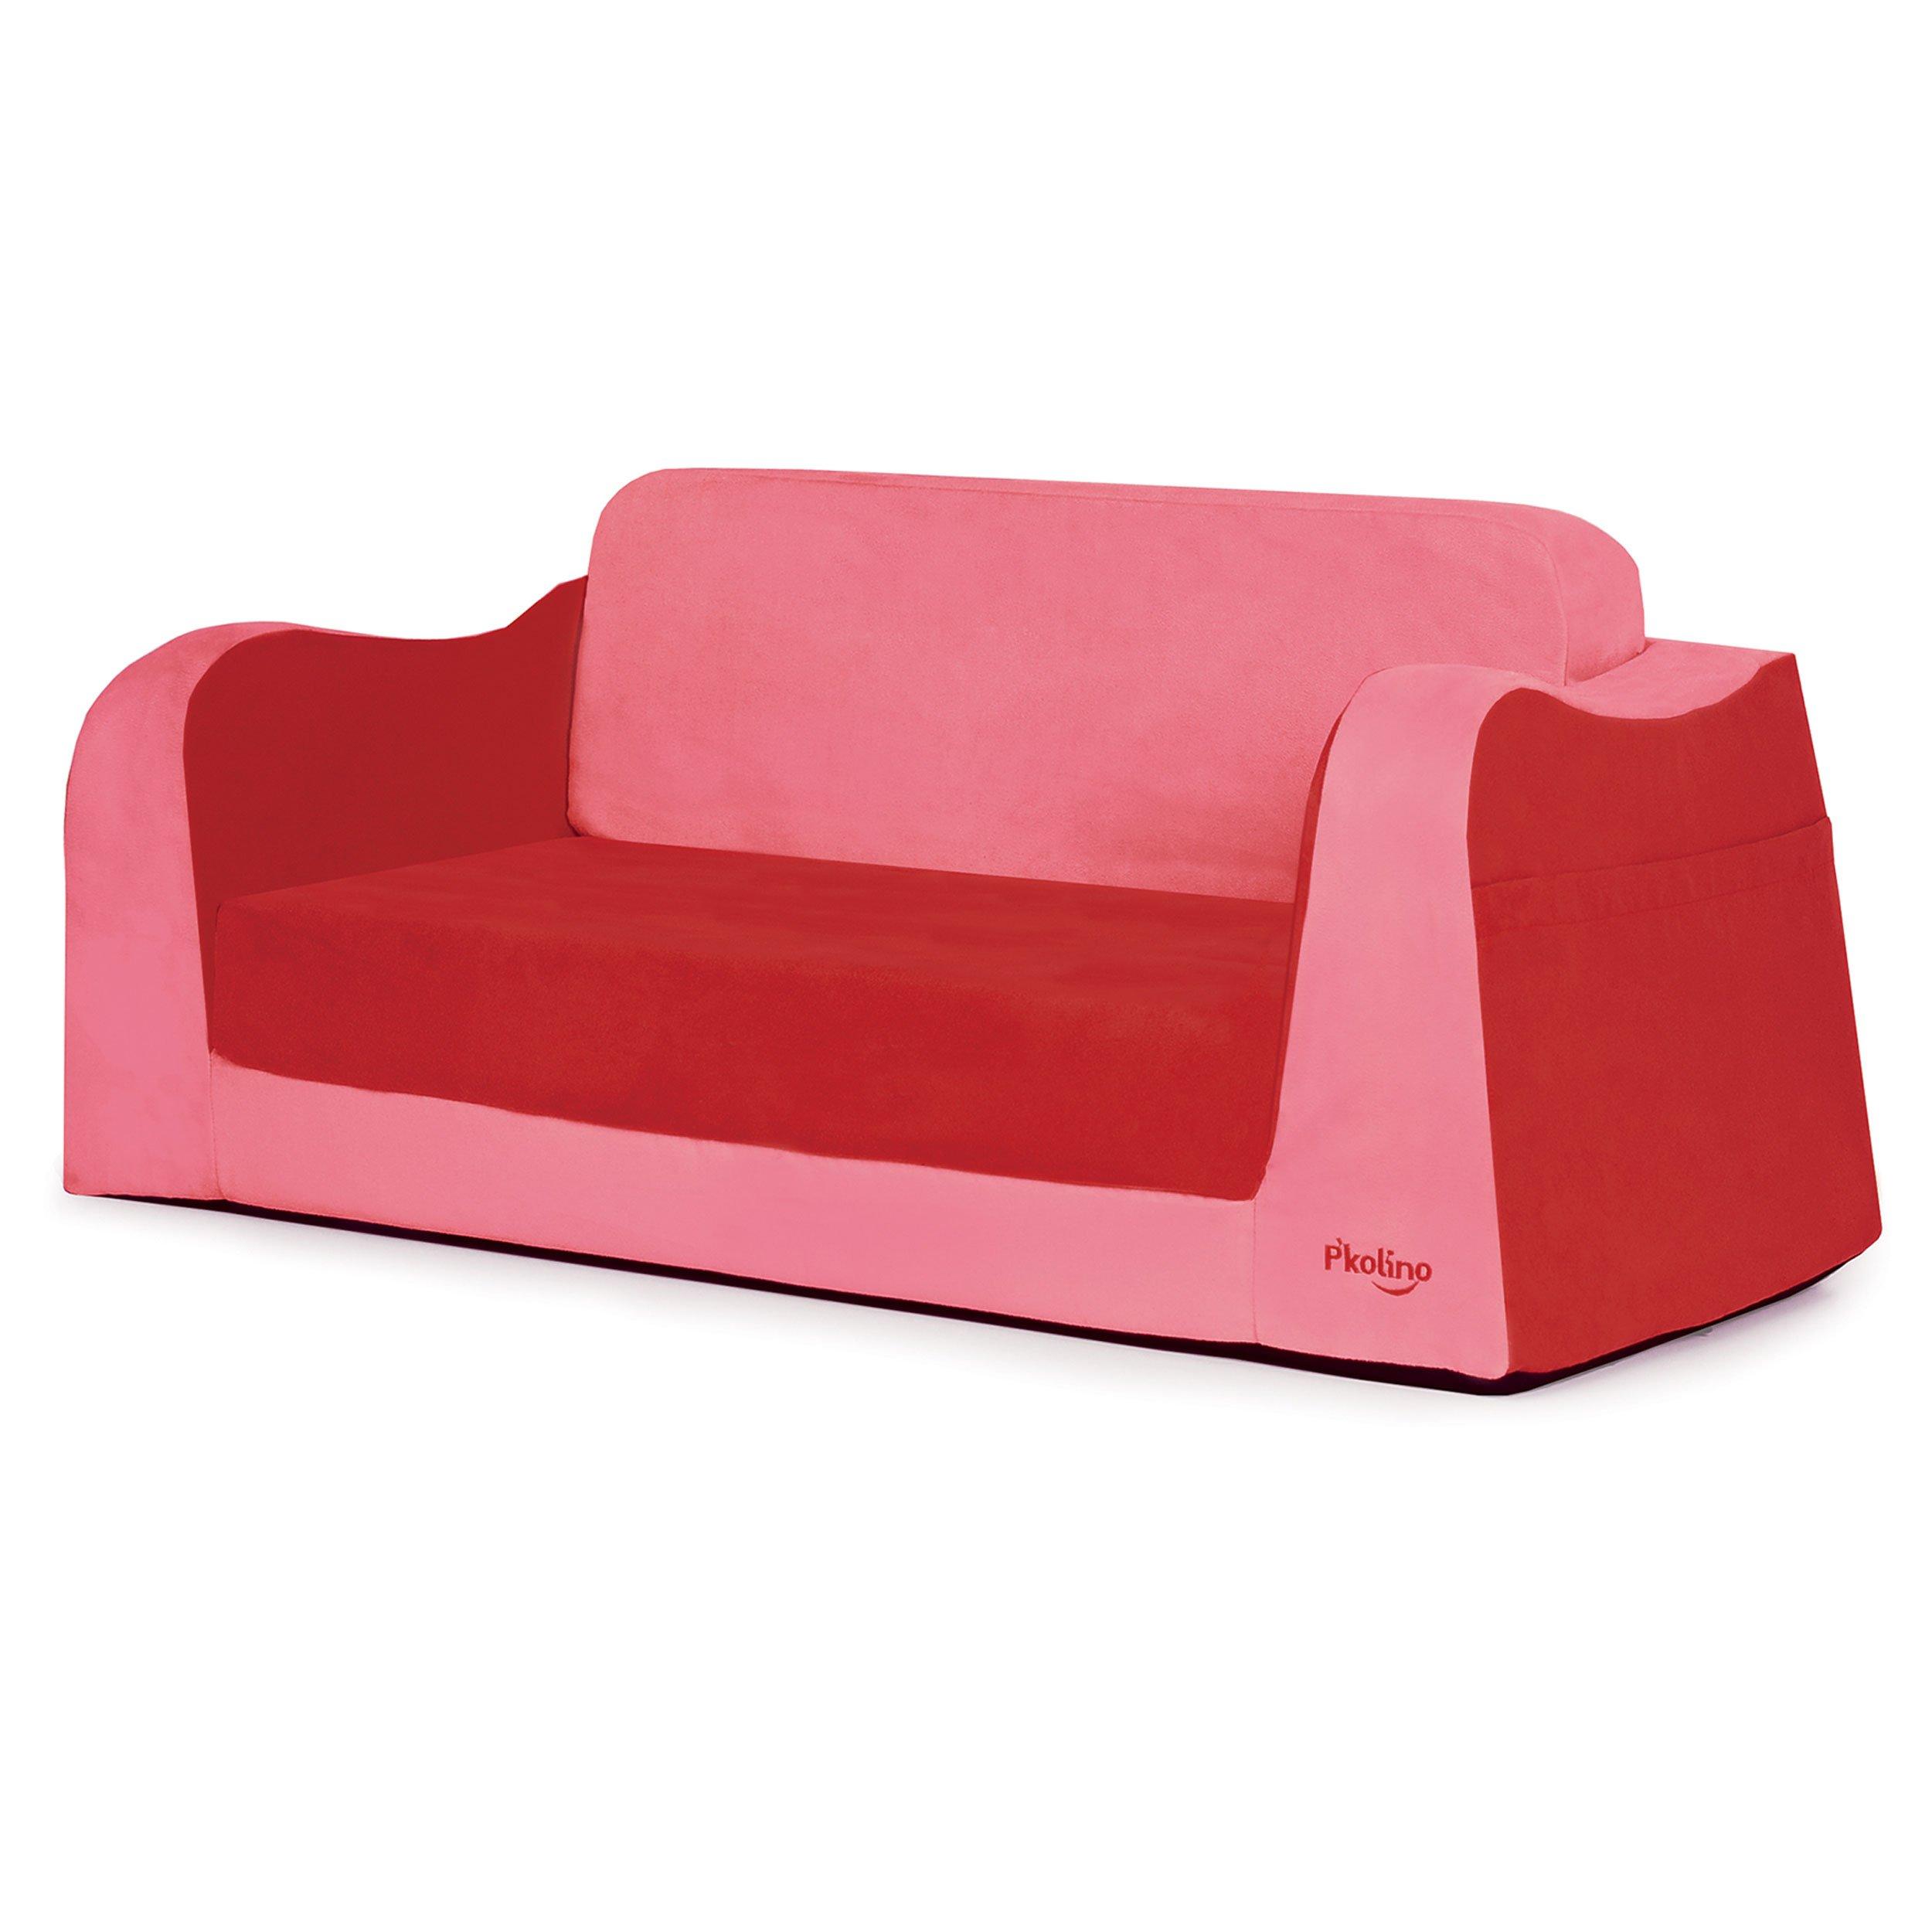 P'kolino Little Sofa / Sleeper - Red by P'Kolino